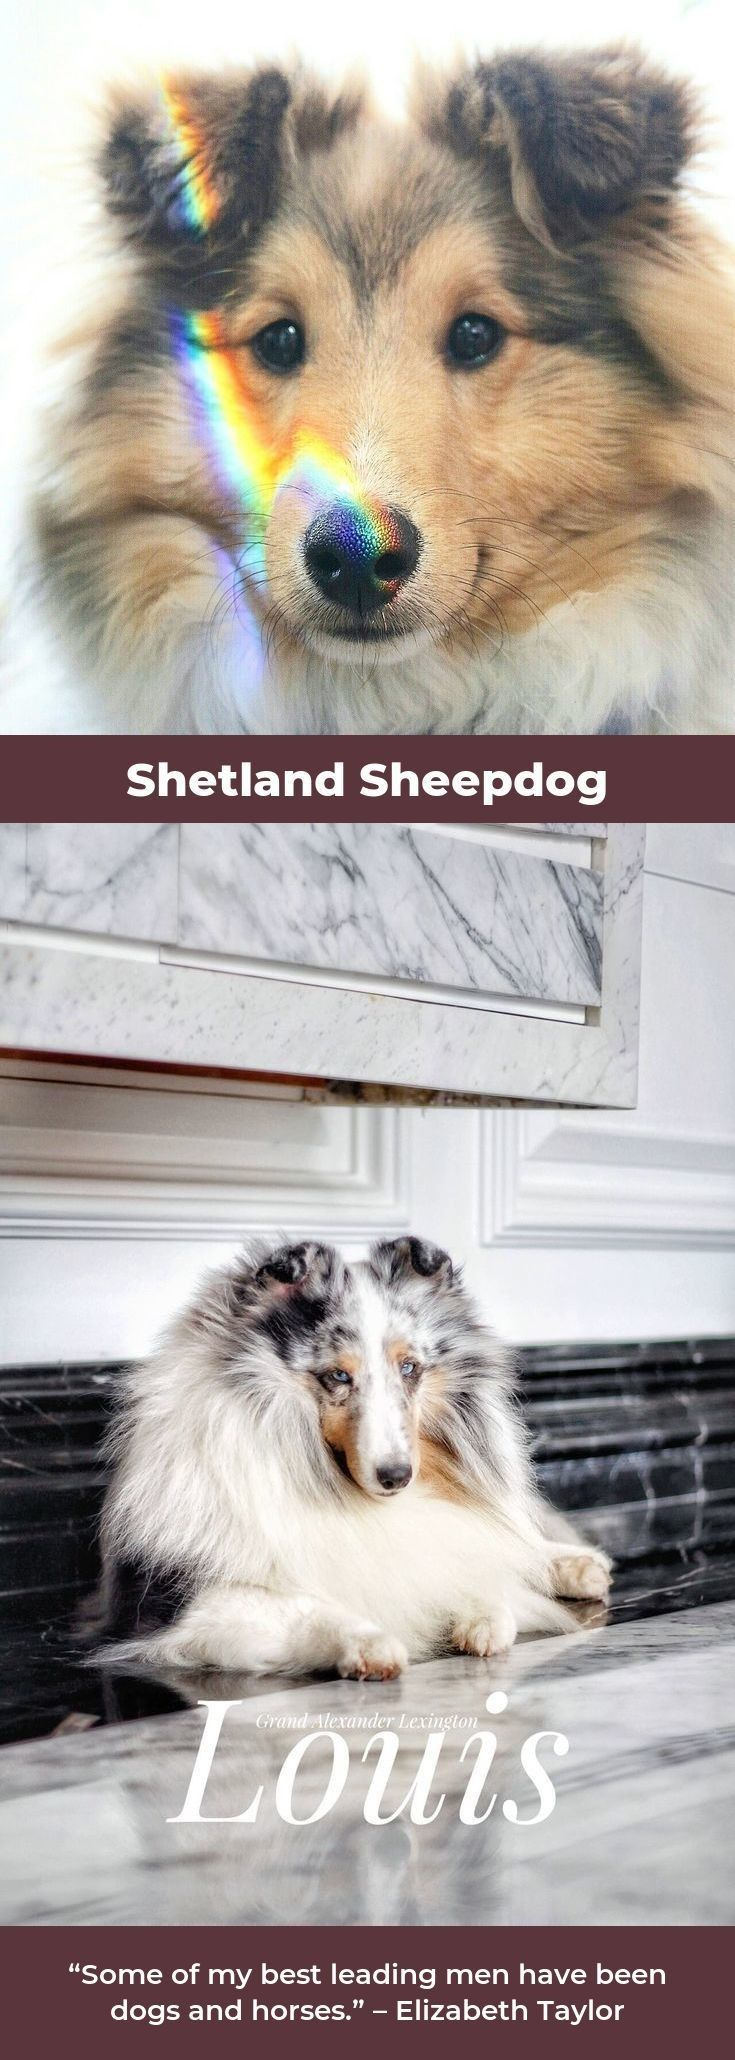 Shetland Sheepdogs shetlandsheepdogpuppy